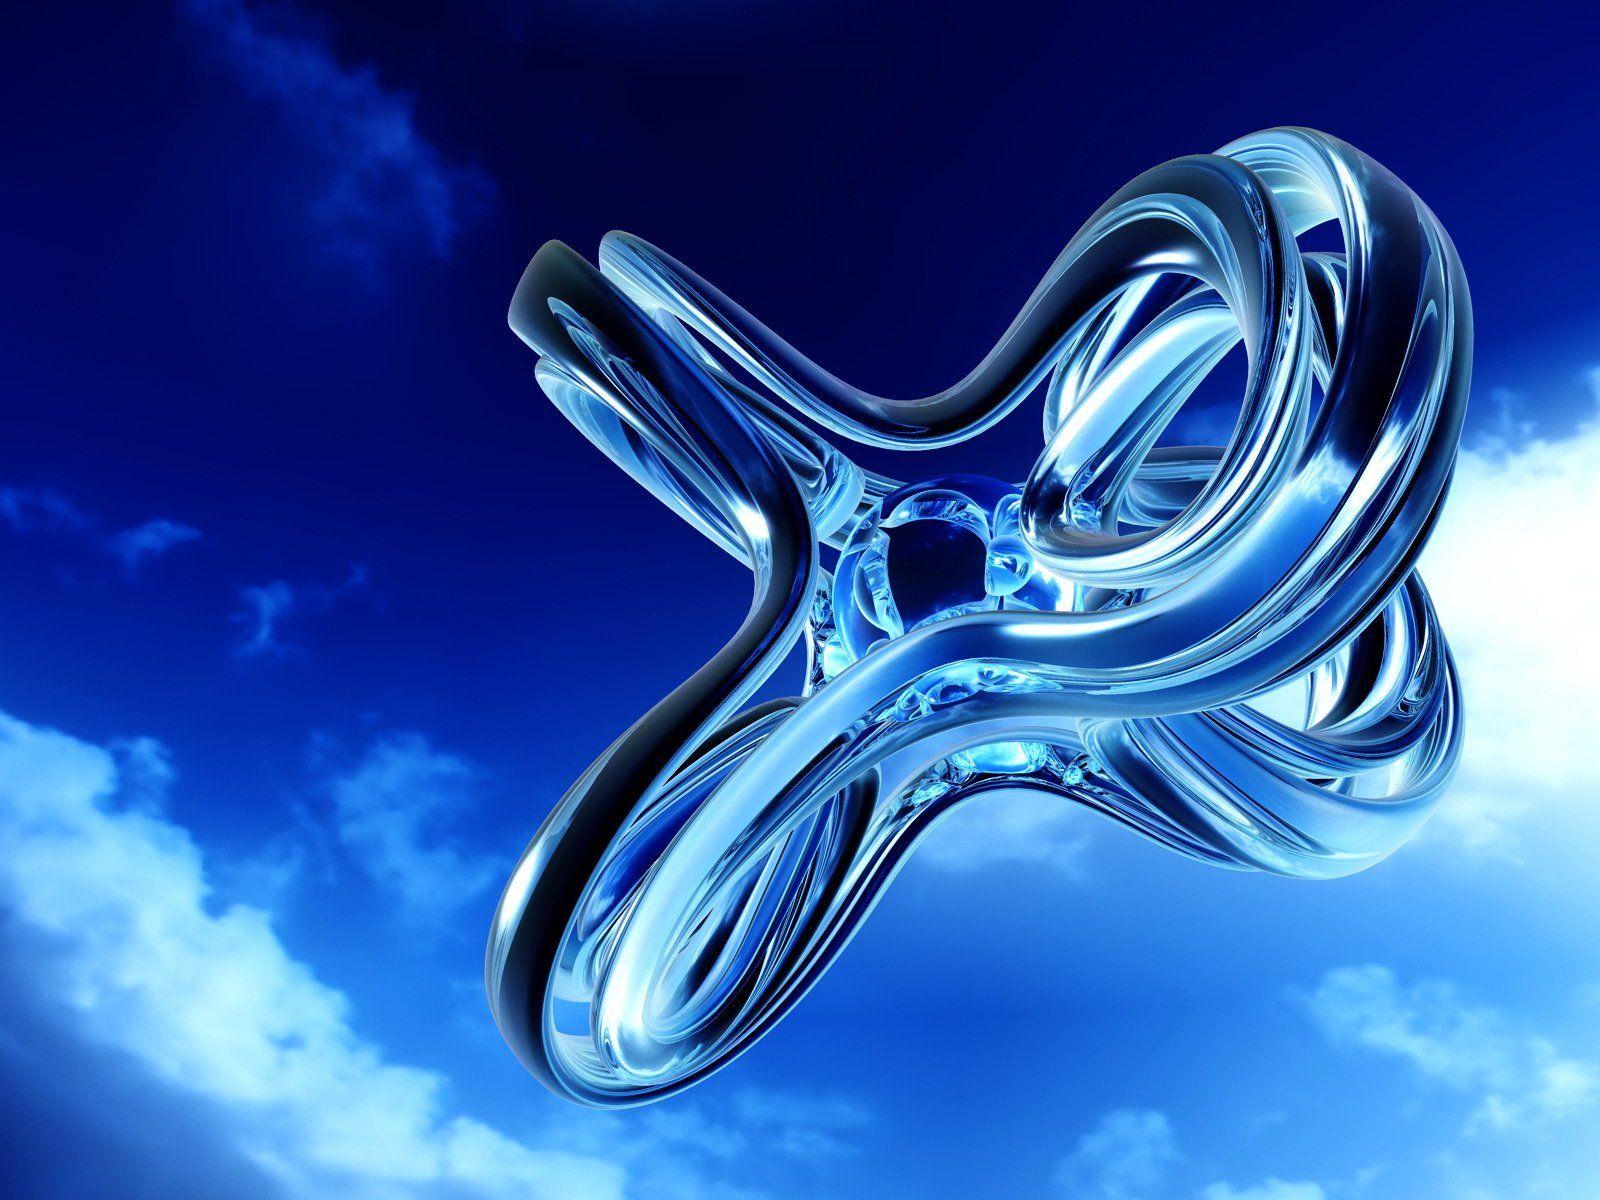 Free 3d Desktop Wallpaper Screensavers Free Blue Knot In The Sky Digital 3d Art Computer Desktop Wallpapers